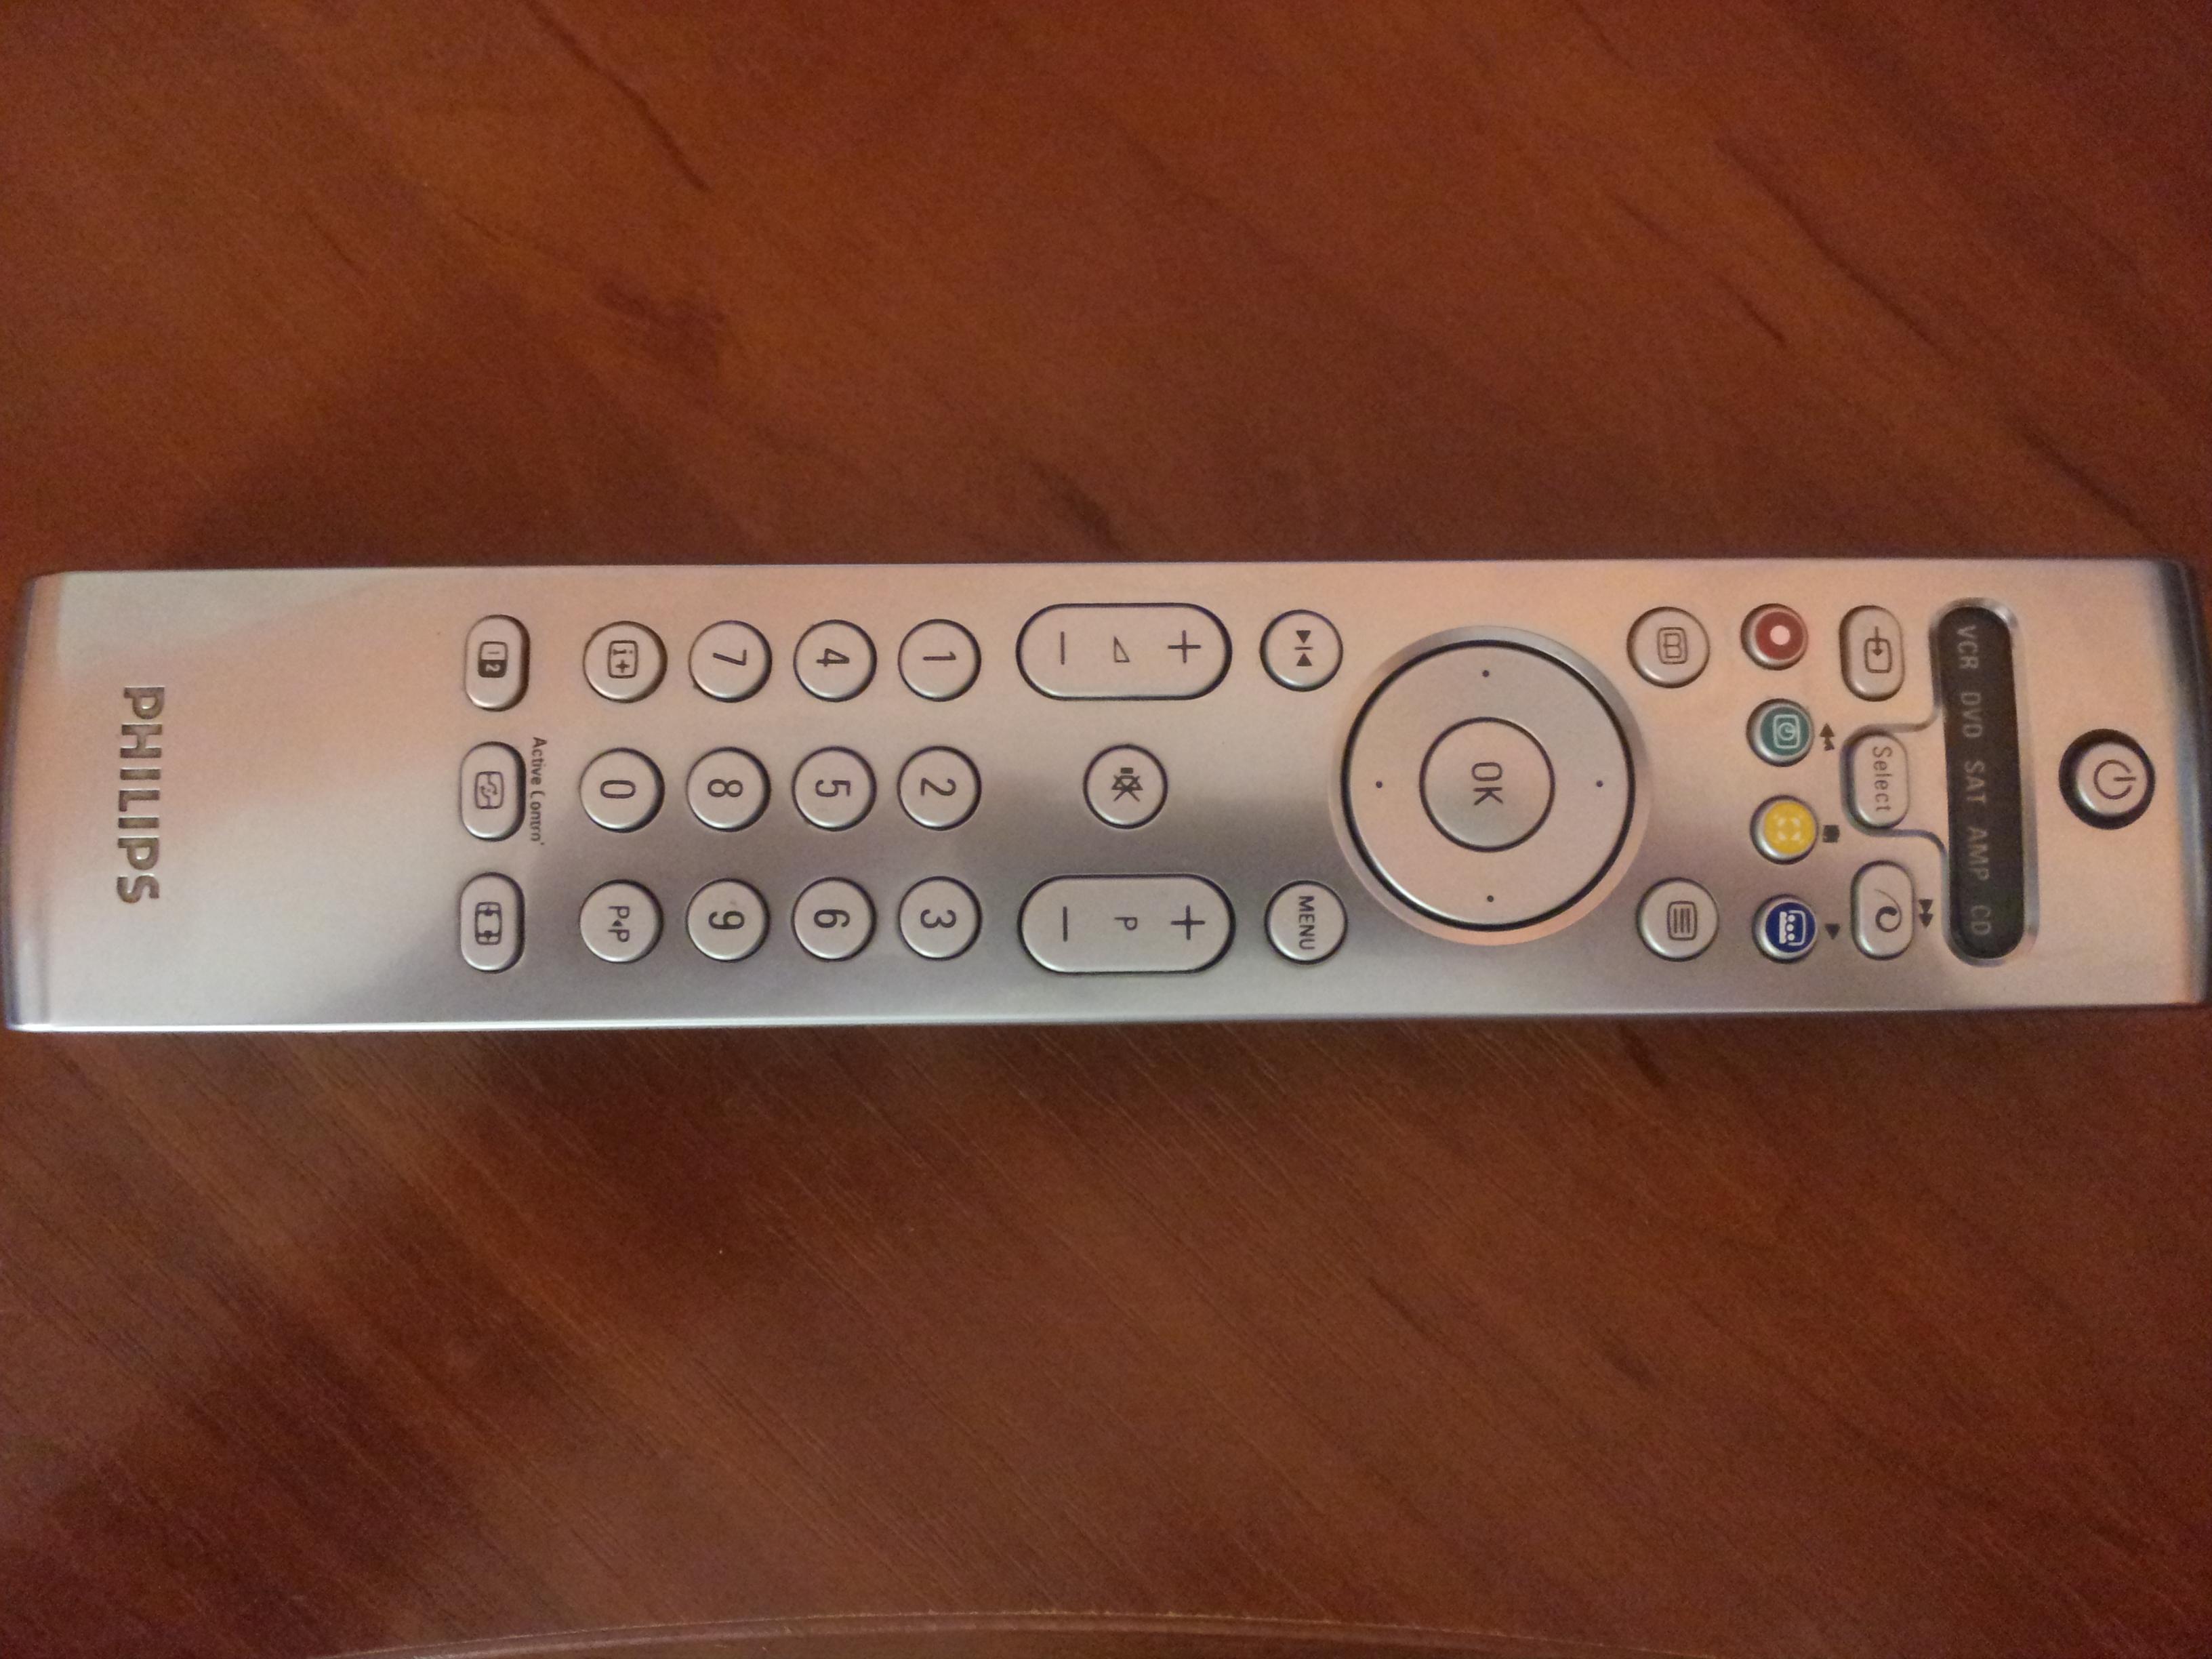 "[Sprzedam] Pilot Philips RC 4301/01B , TV 19"" USB HDMI GWARANCJA , Kilka TV"